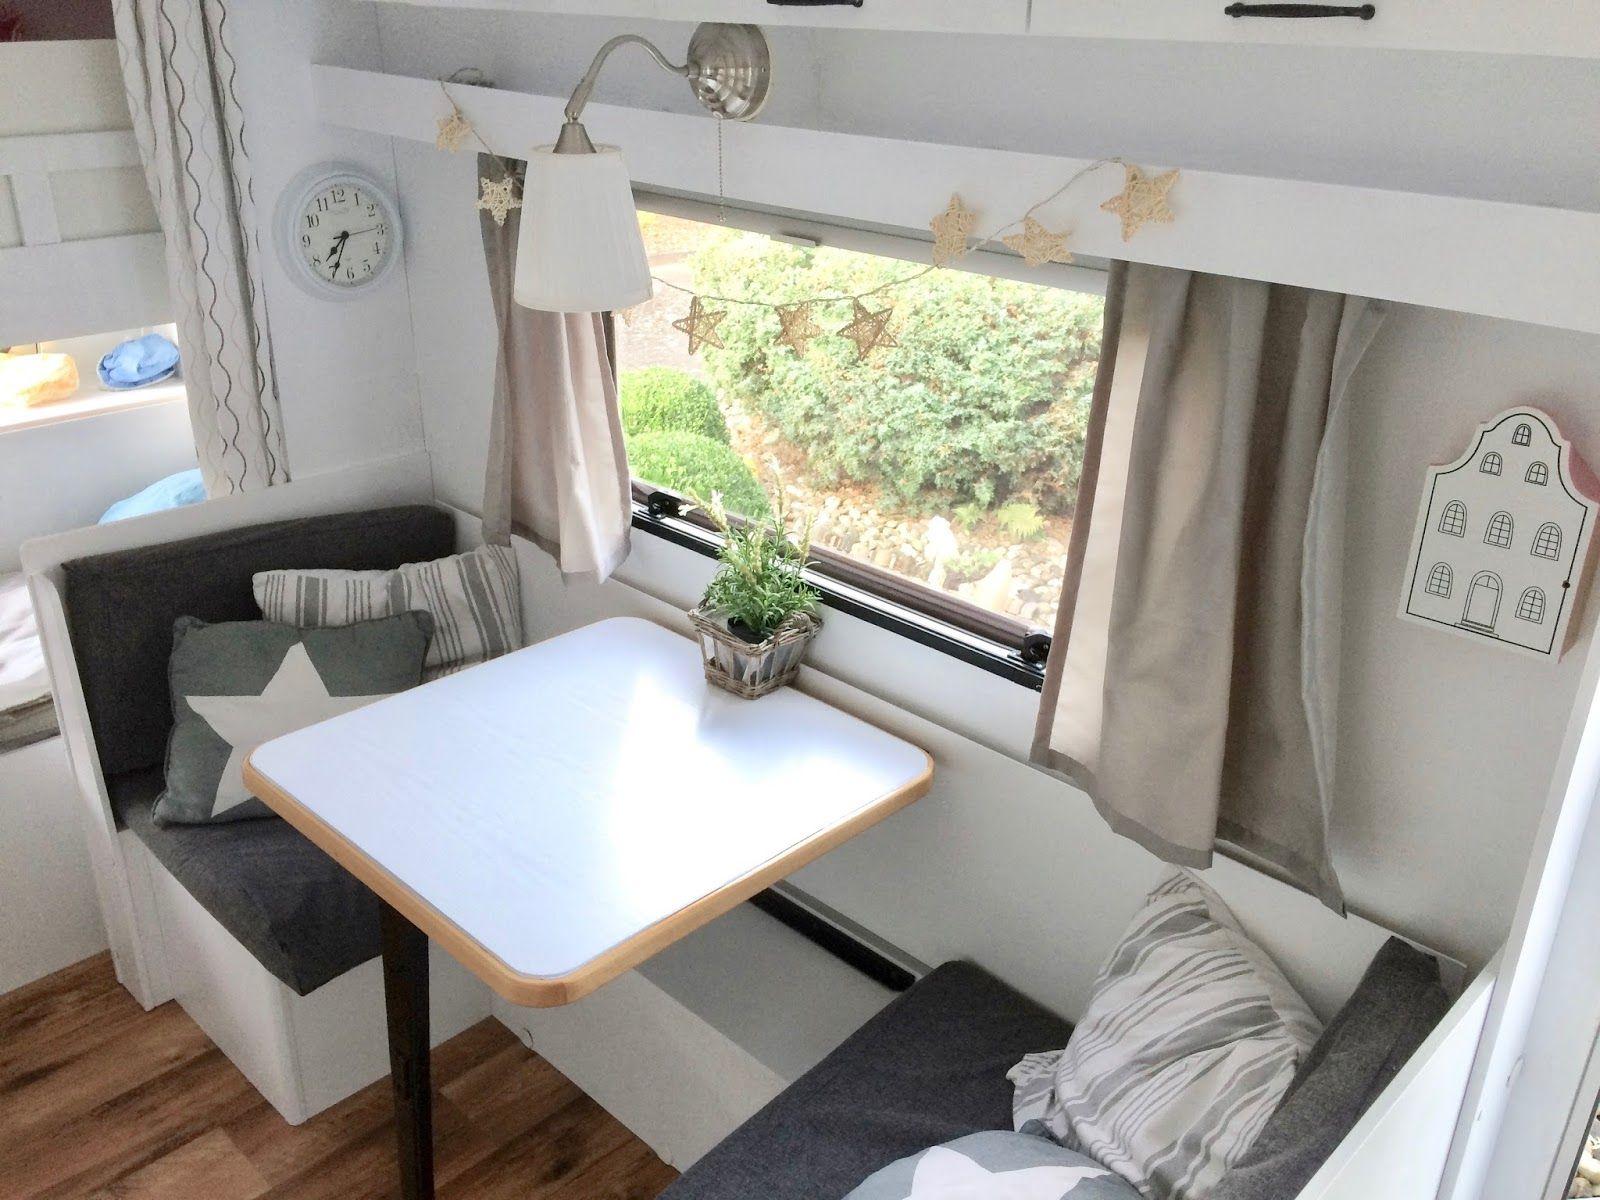 Wohnwagen Camping Glamping Caravan Makeover Renovierung So ...